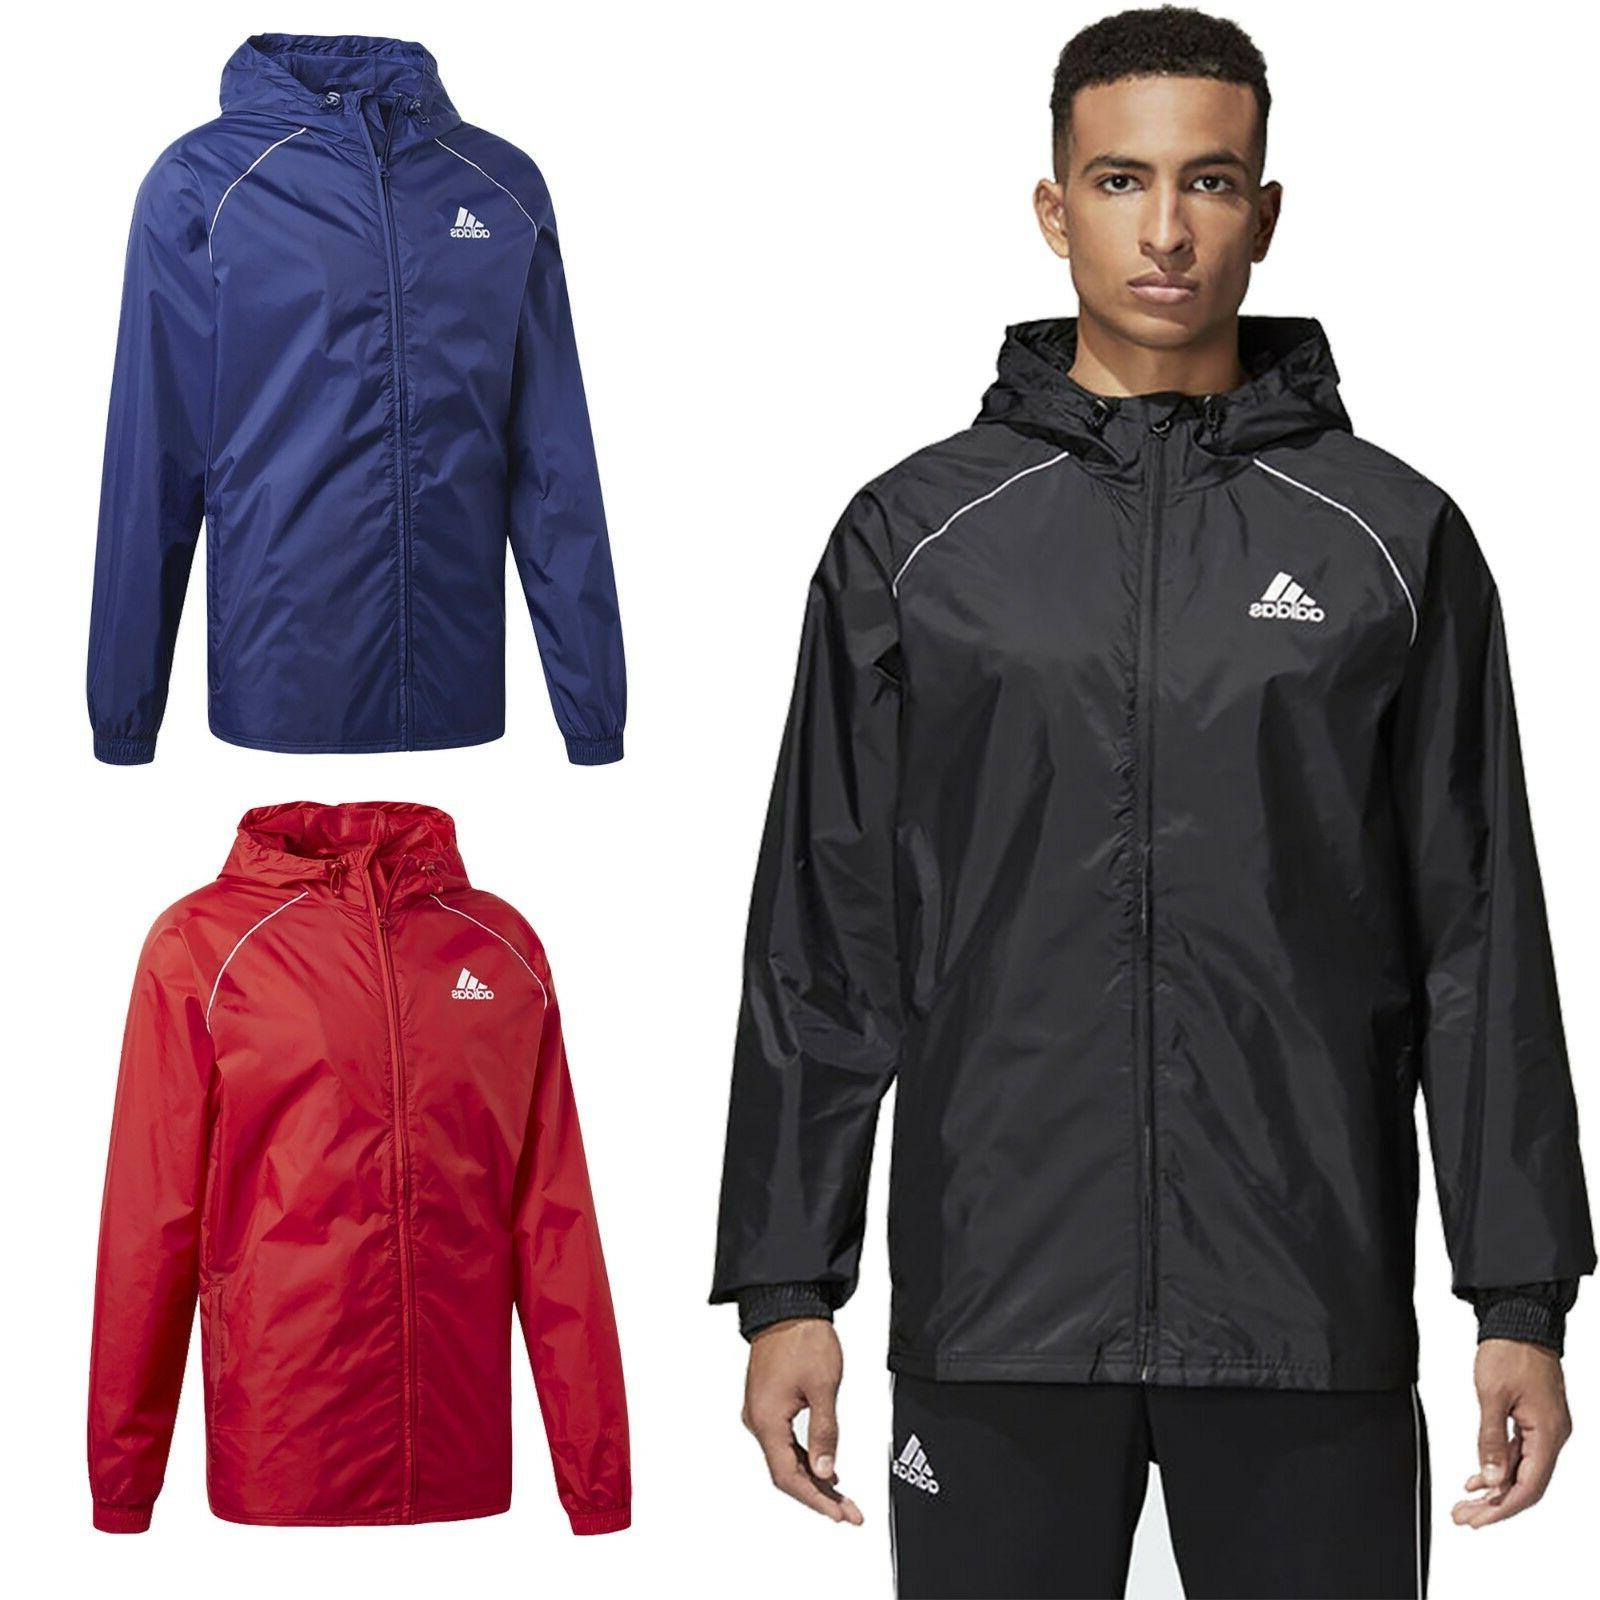 Adidas Mens Lightweight Rain Jacket Waterproof Coat Top Hood